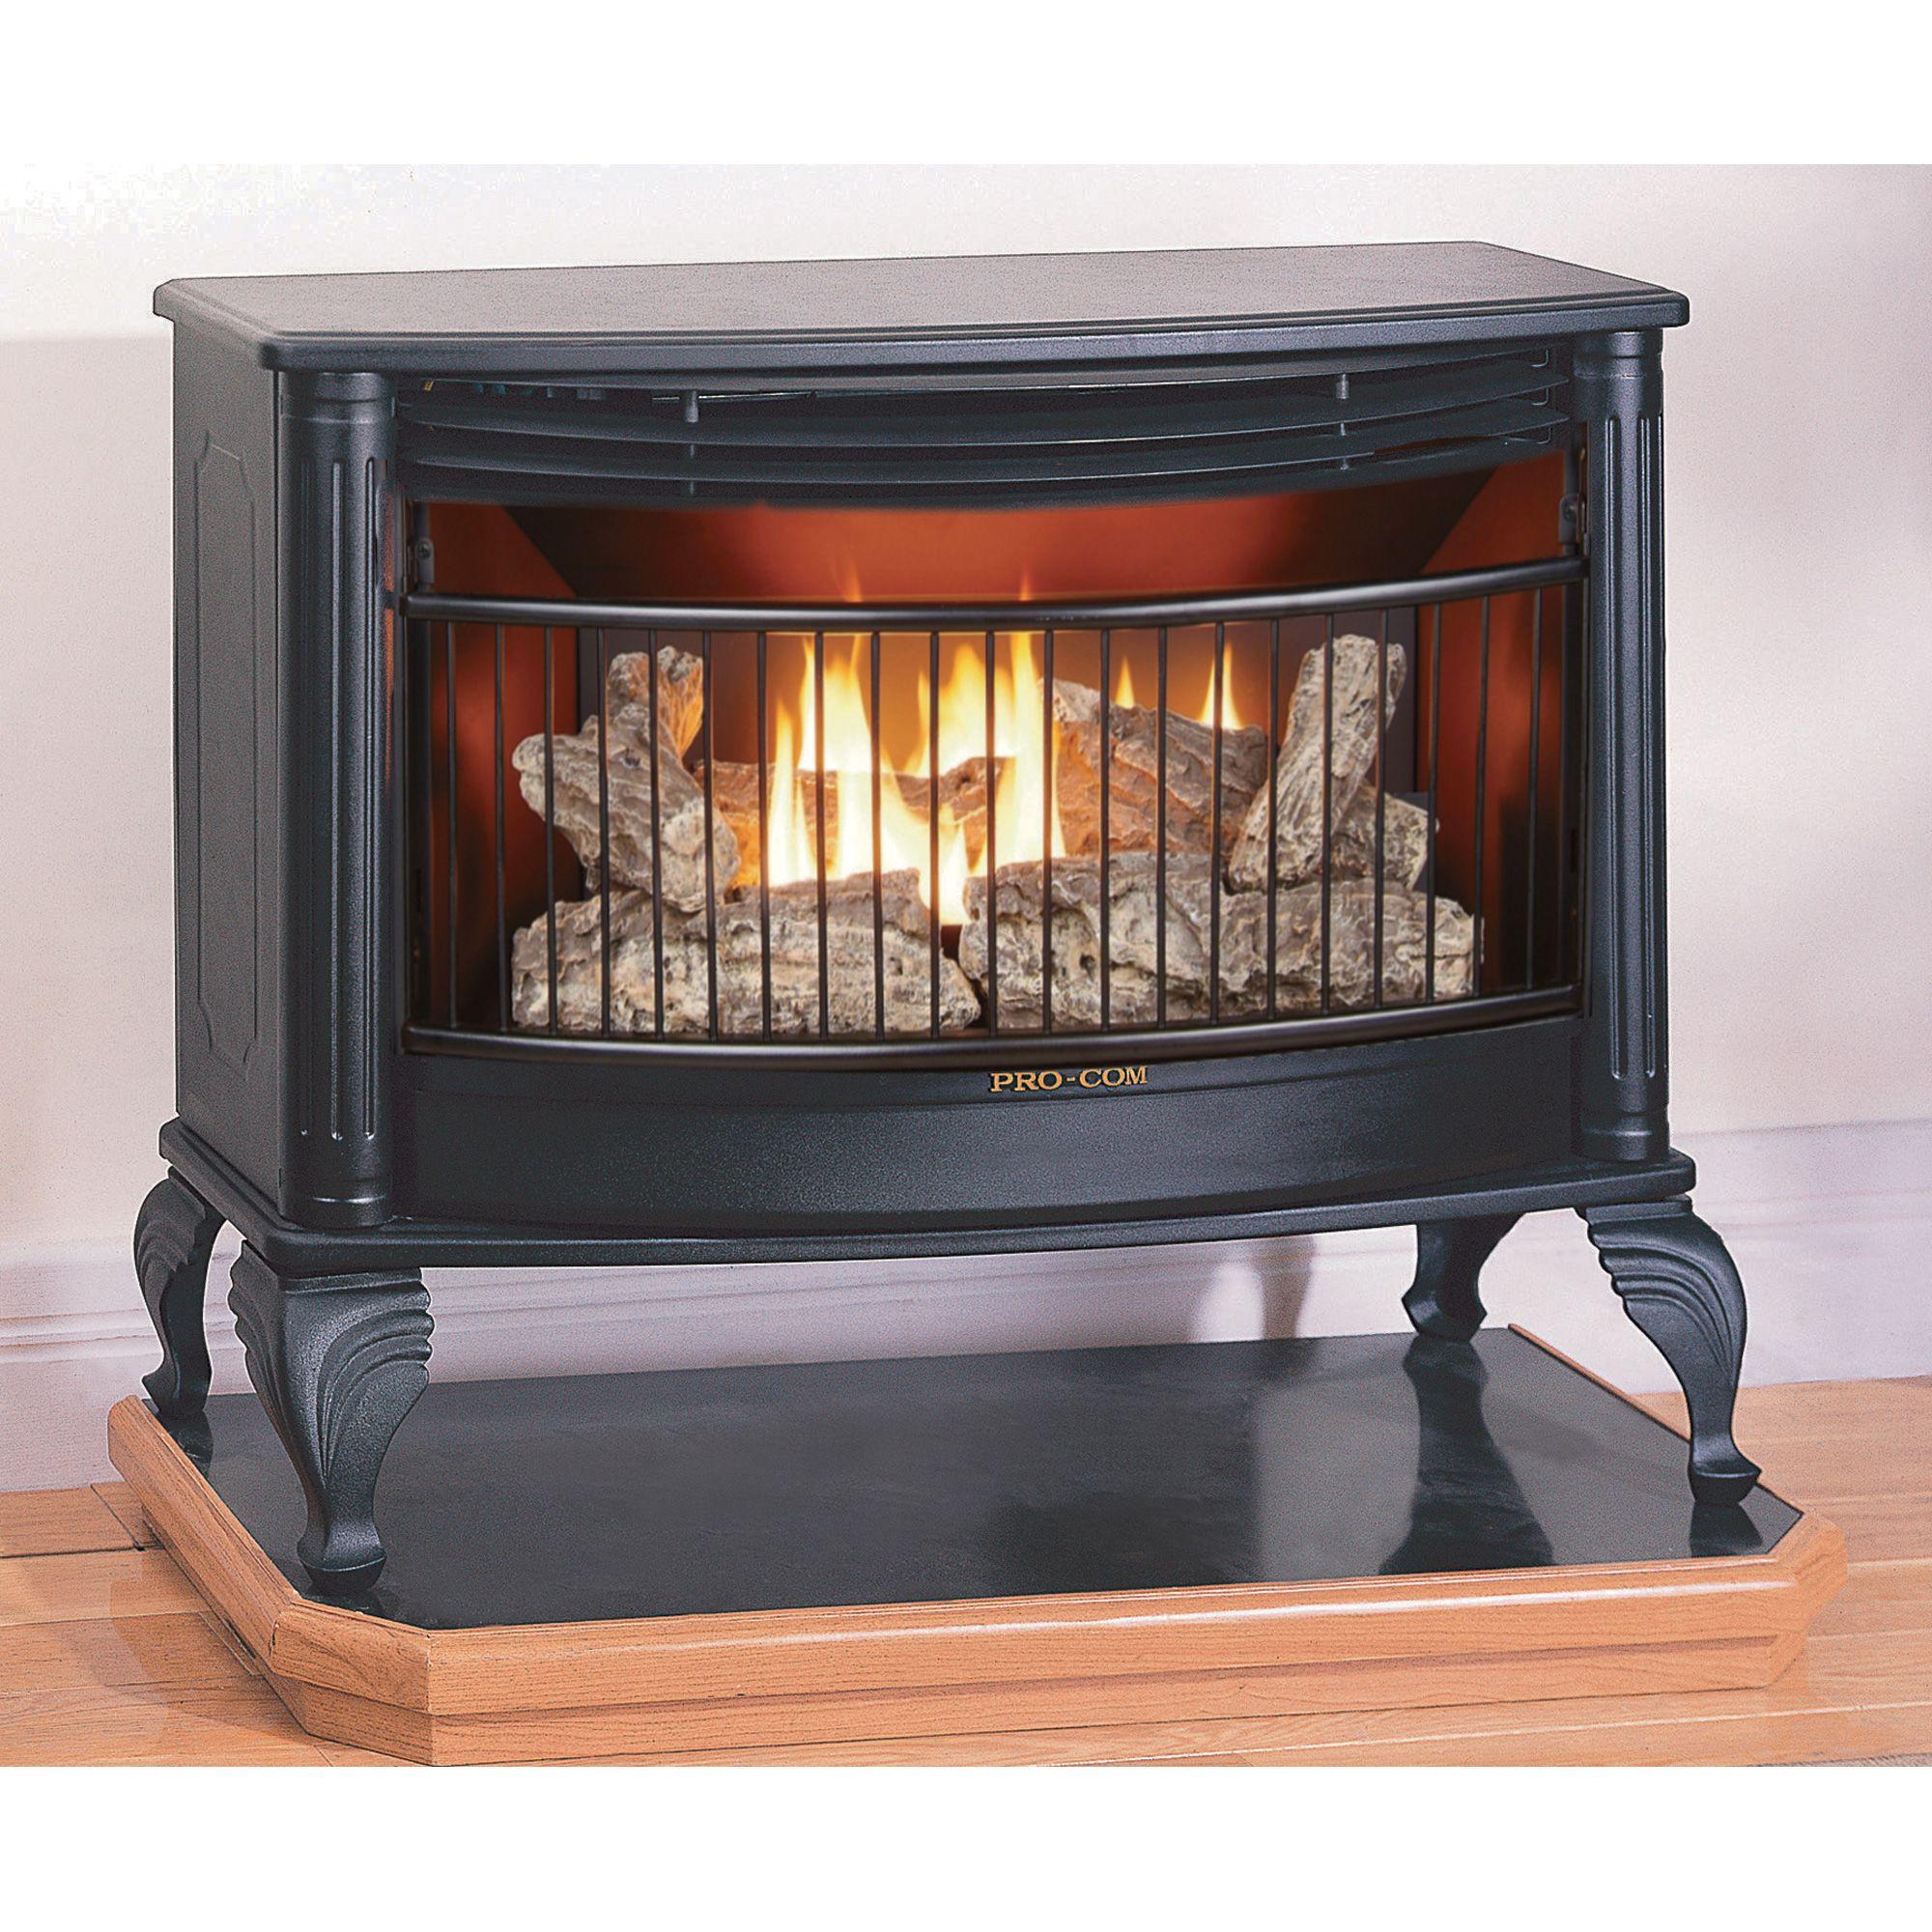 Procom dual fuel stove 25 000 btu model qd250t dual fuel gas propane heaters northern - Small space wood stove model ...